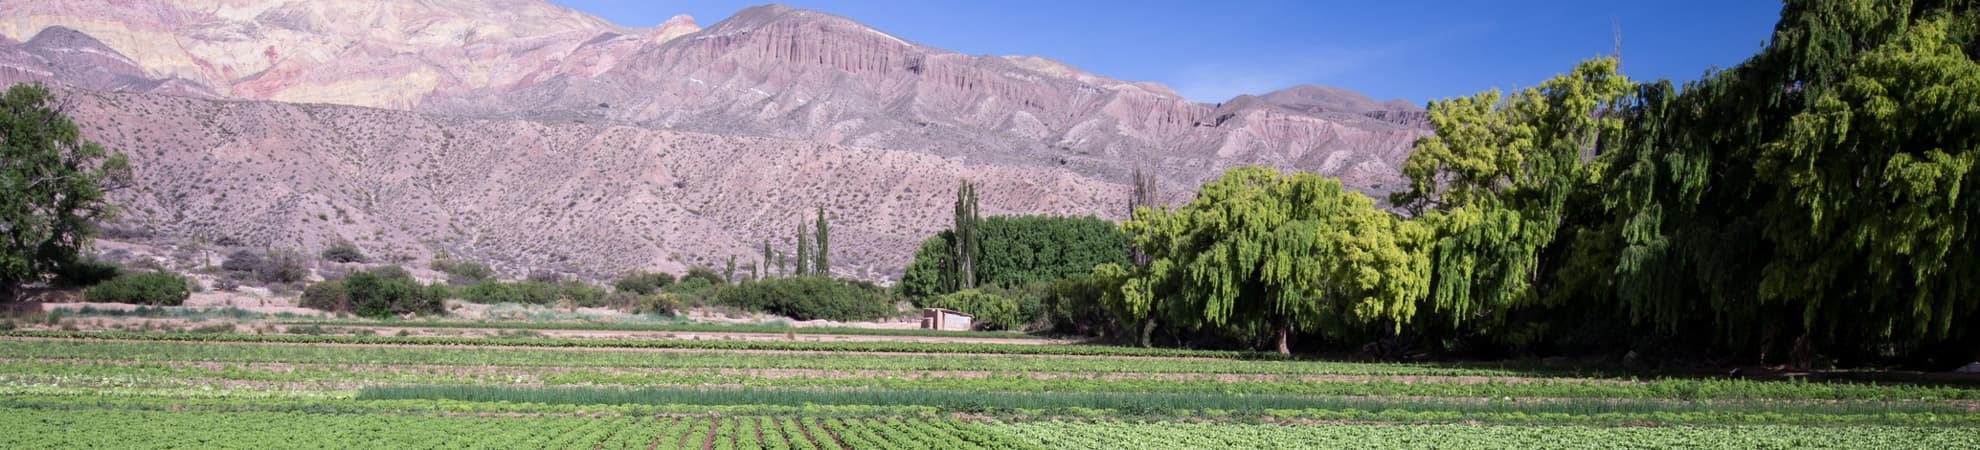 La Pampa en Argentine